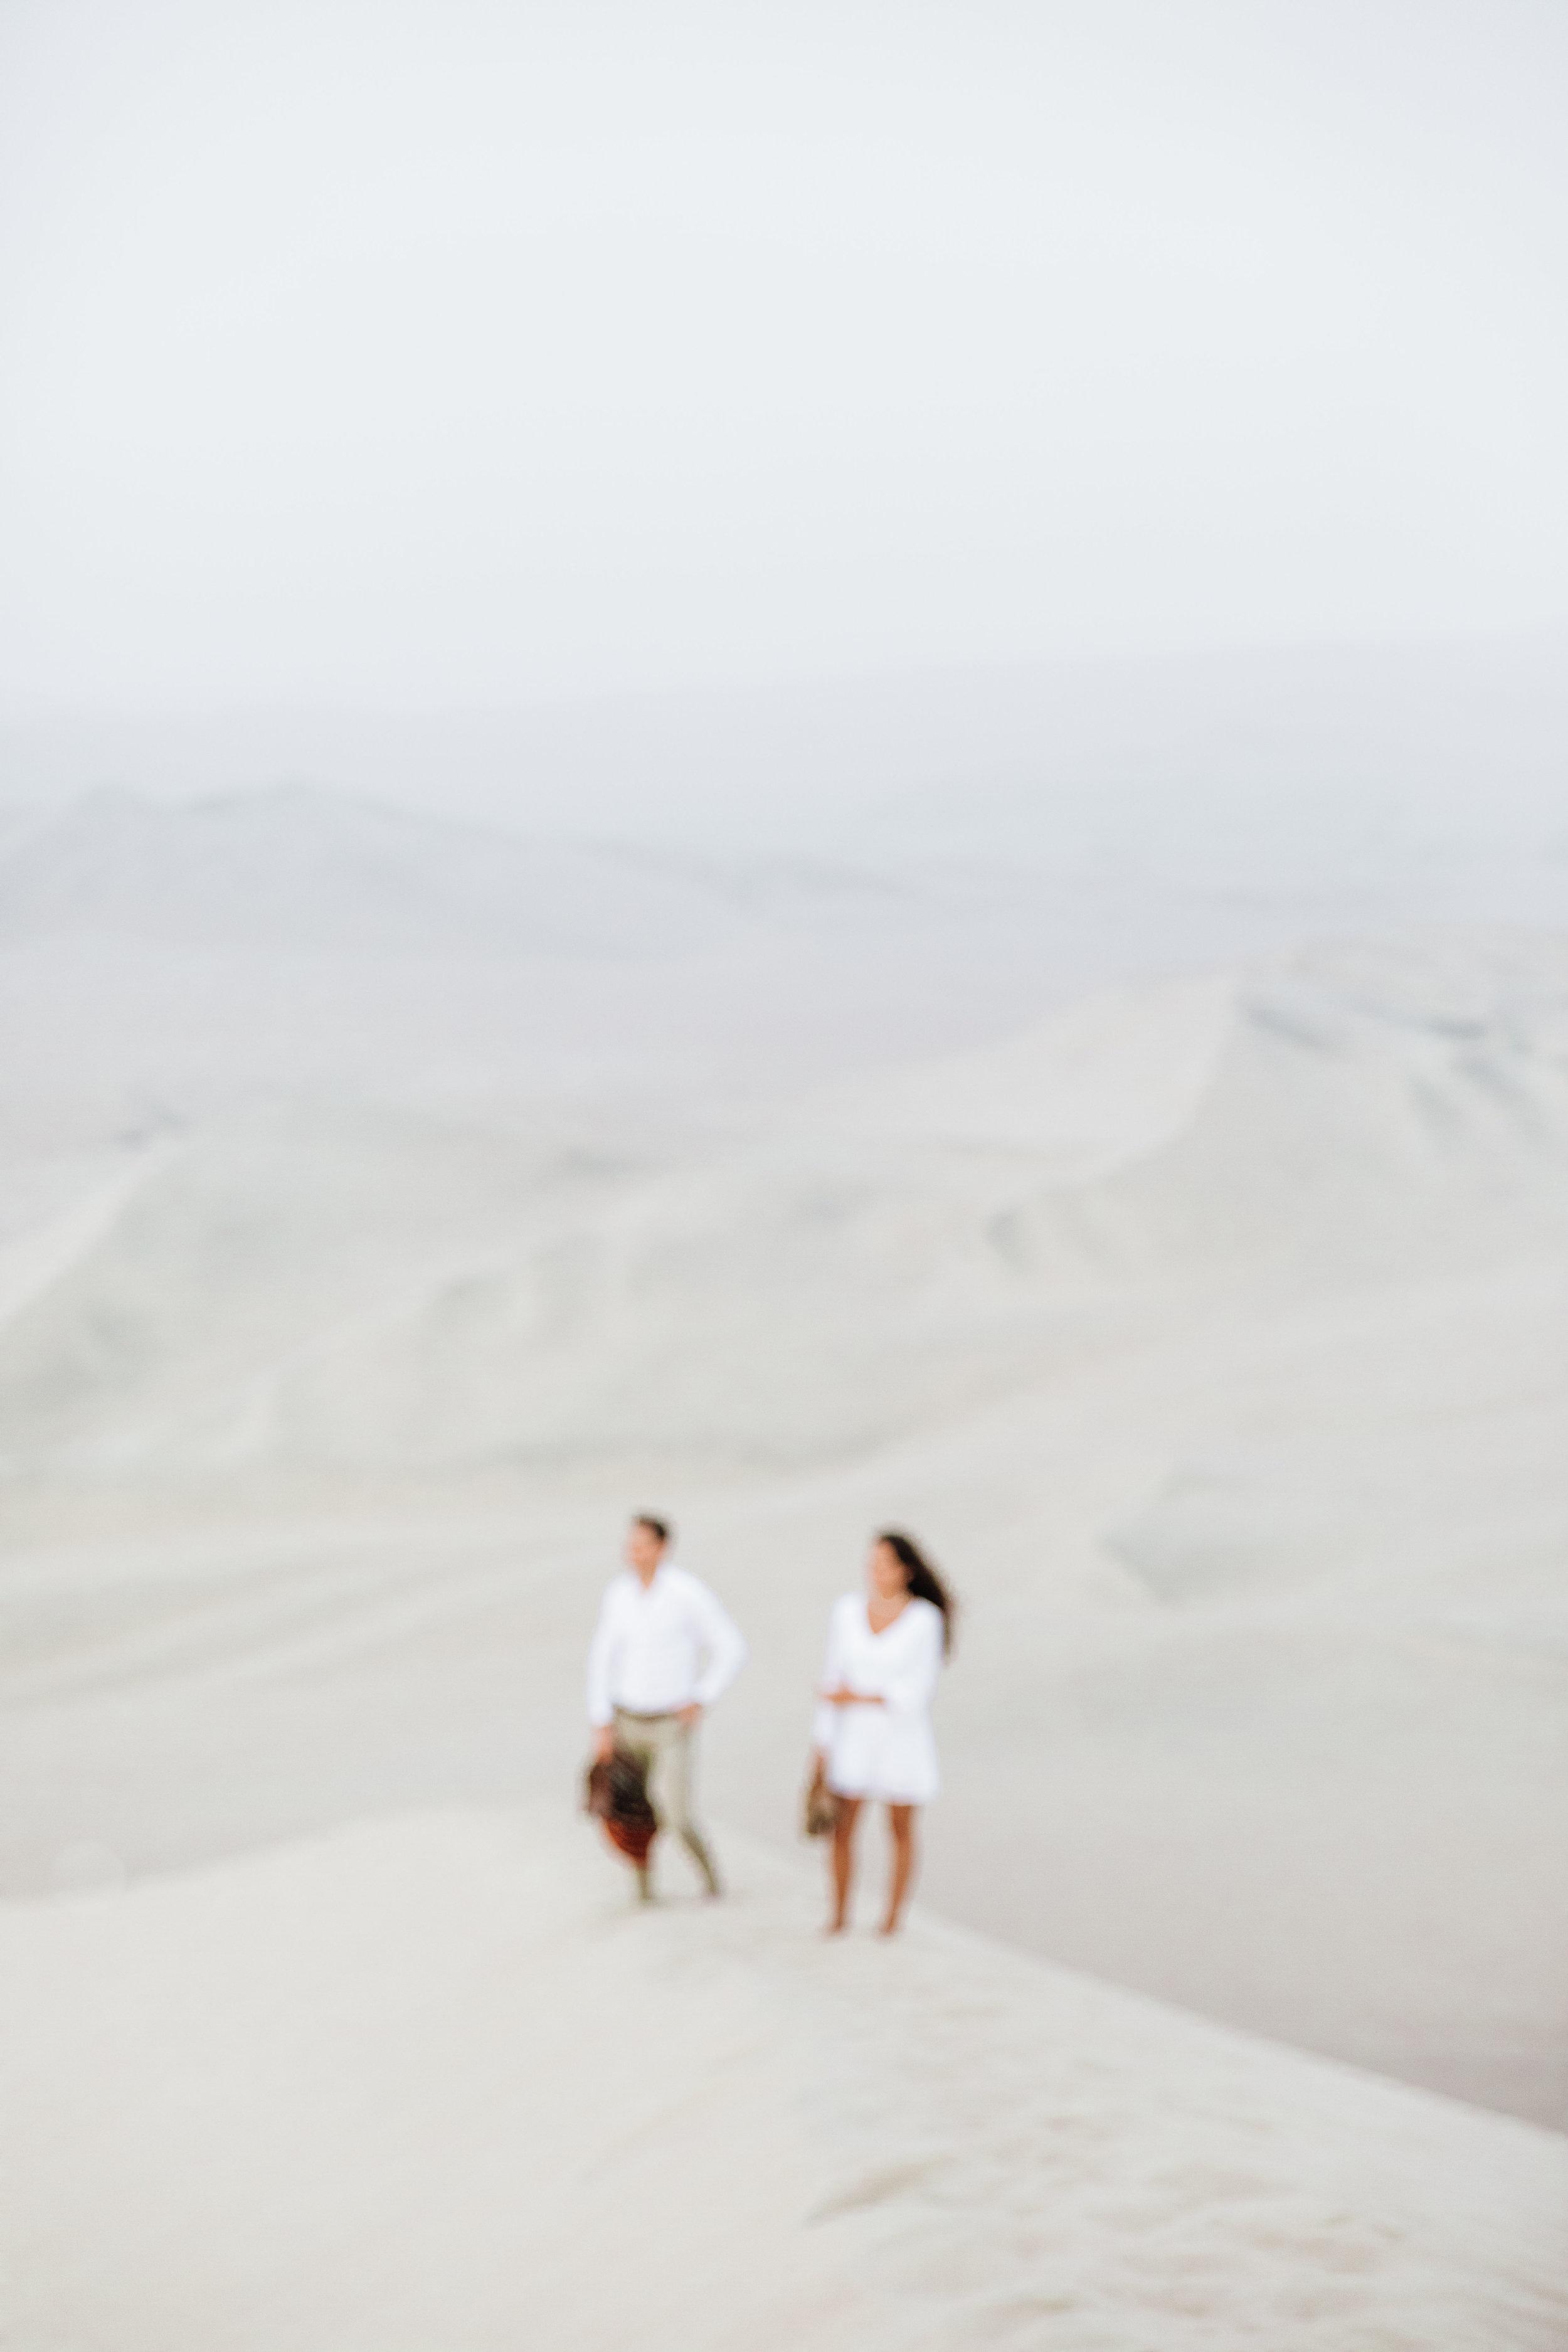 huacachina-peru-honeymoon-elopement-destination-wedding-photography-michael-cozzens-16.jpg